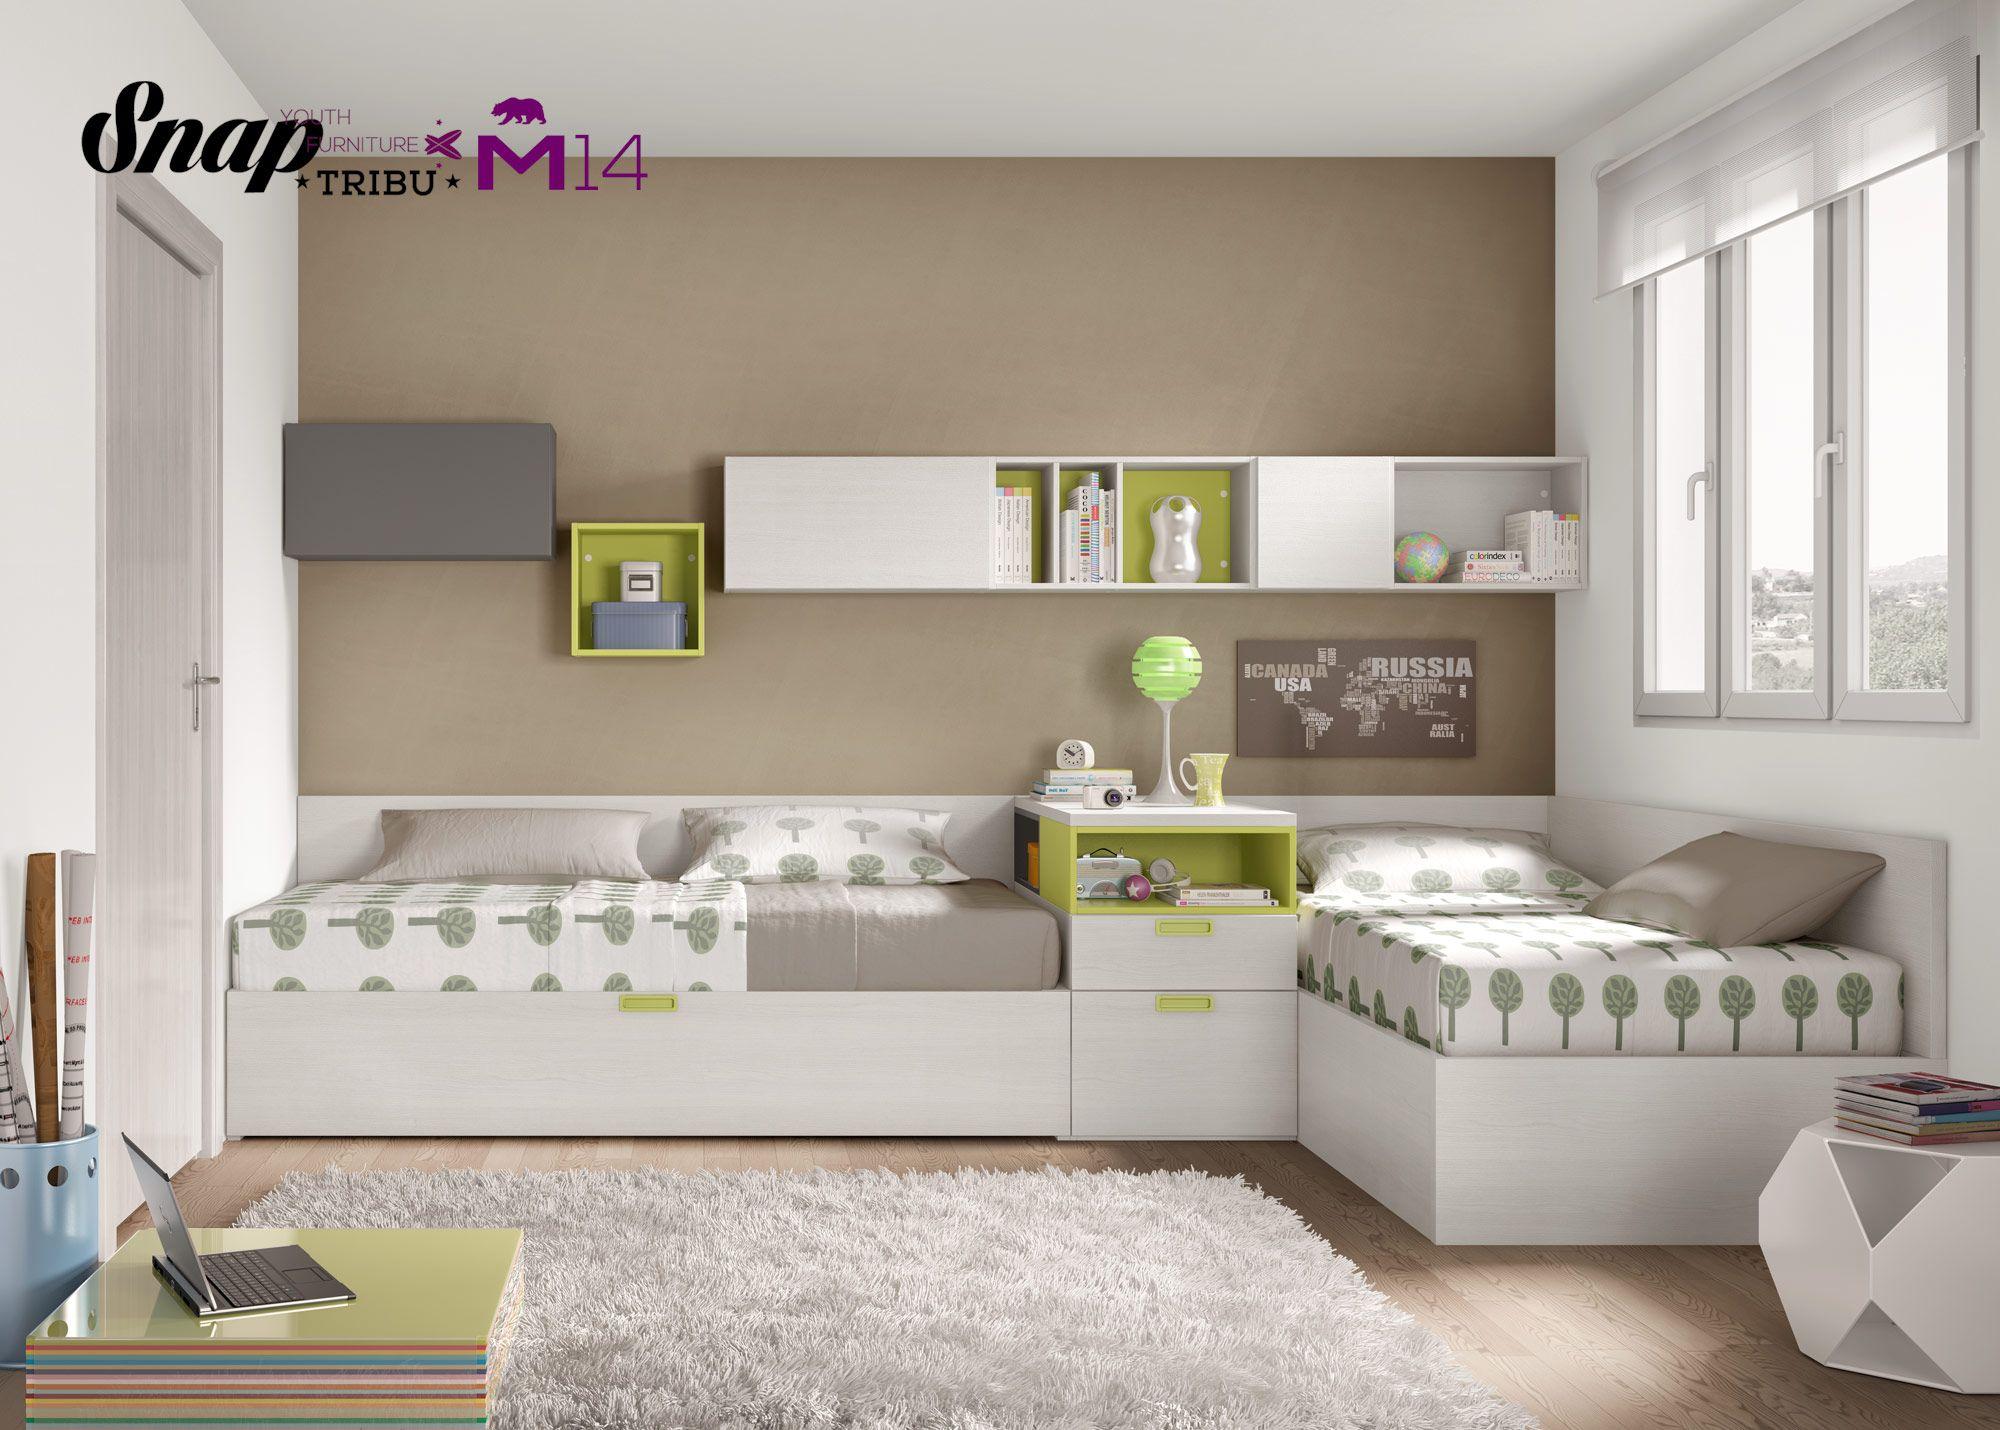 Tribu snap muebles hermida mueble juvenil m14 for Dormitorio juvenil nina